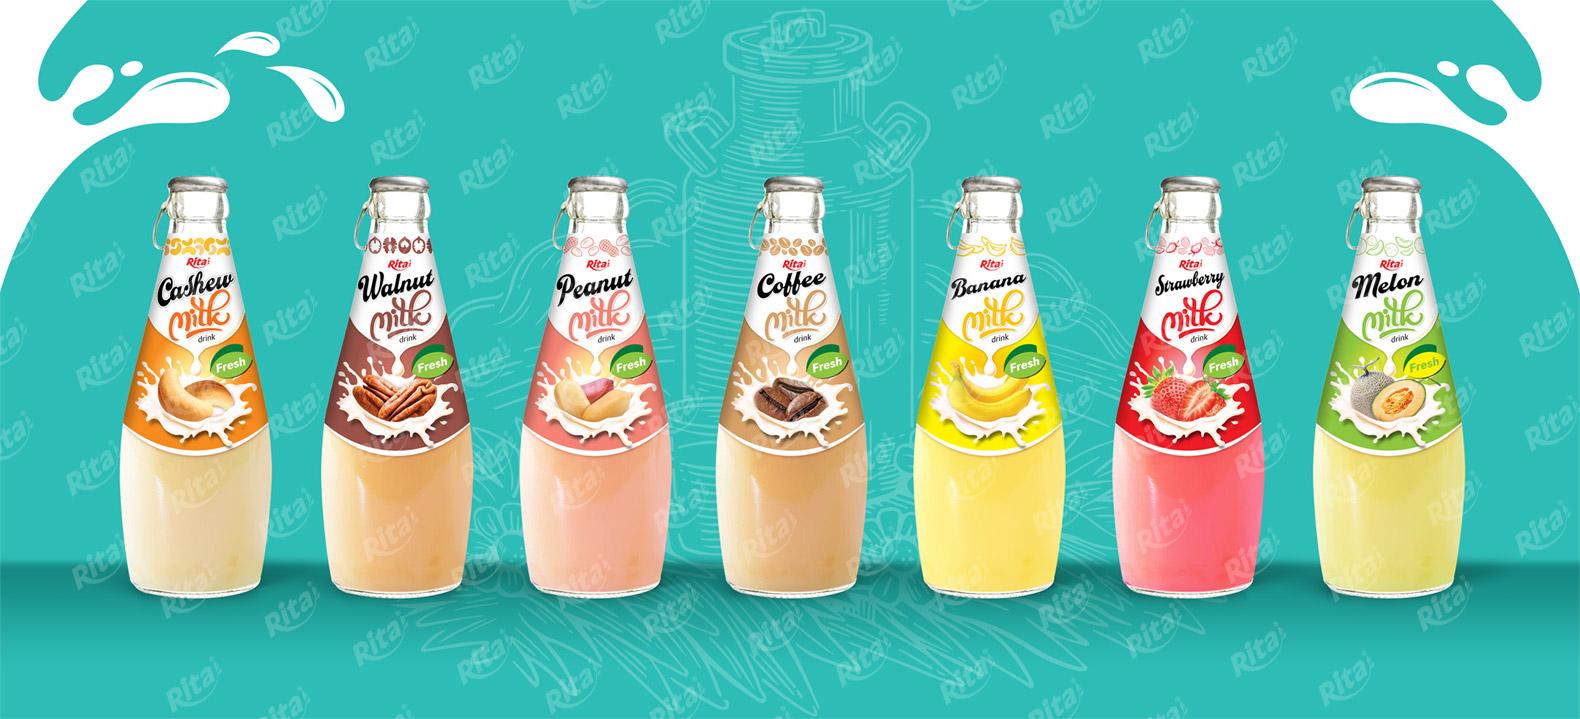 Melon milk 290ml